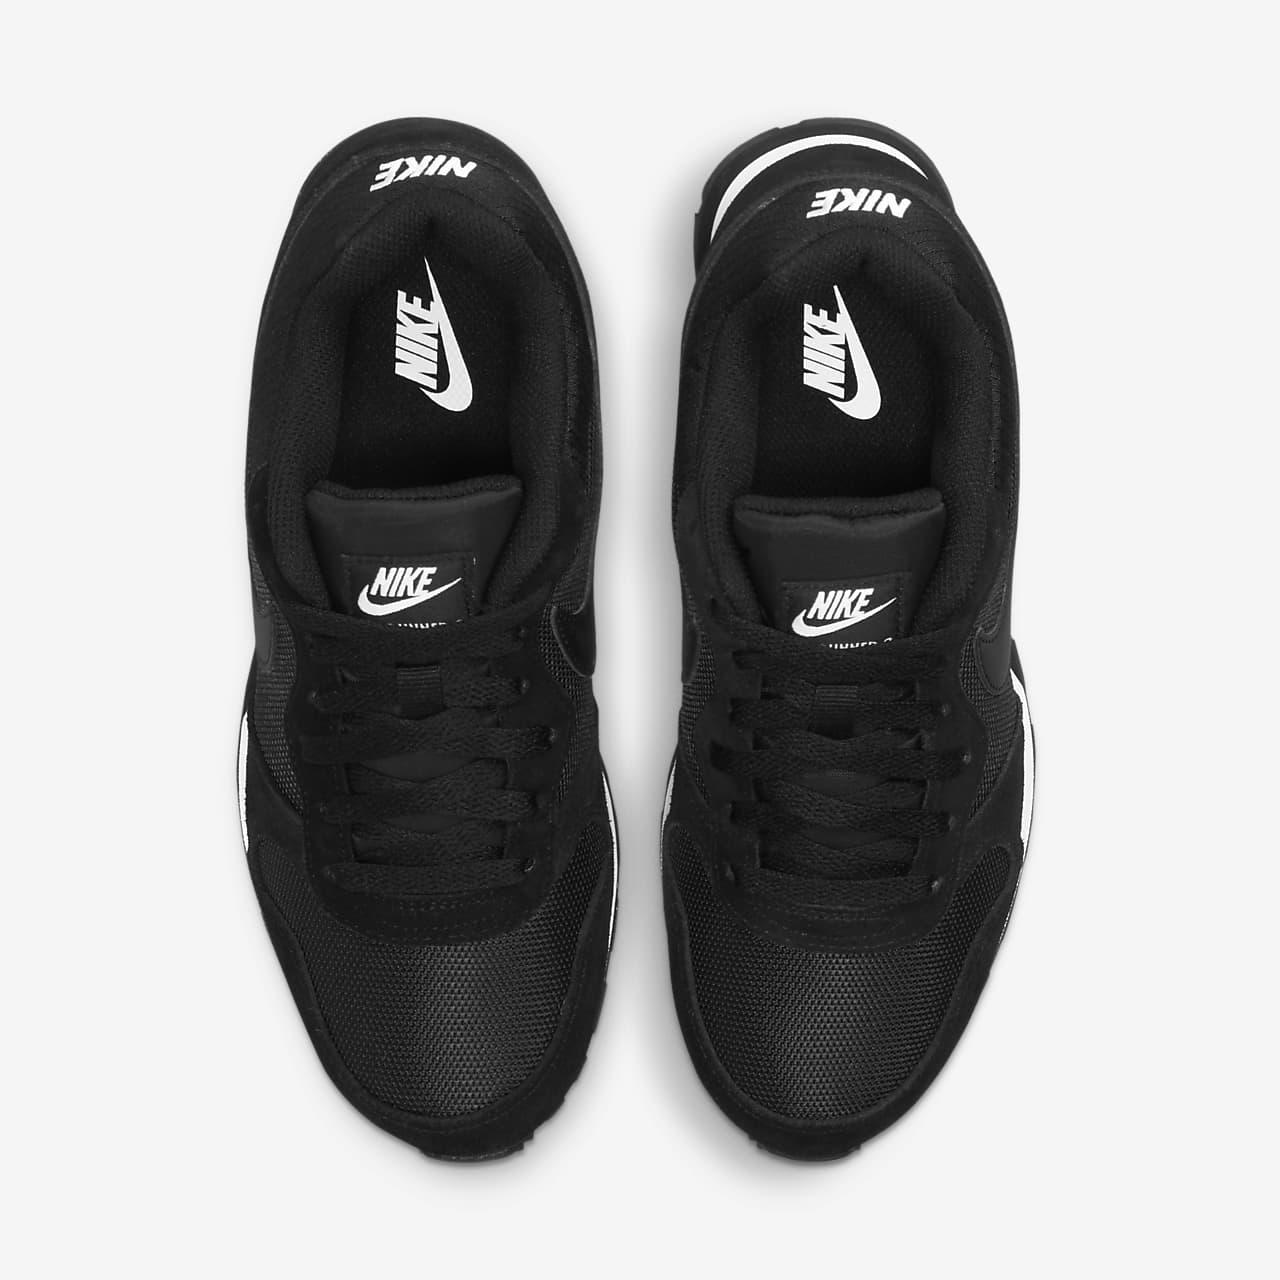 4b313f95f32b Nike MD Runner 2 Women s Shoe. Nike.com GB